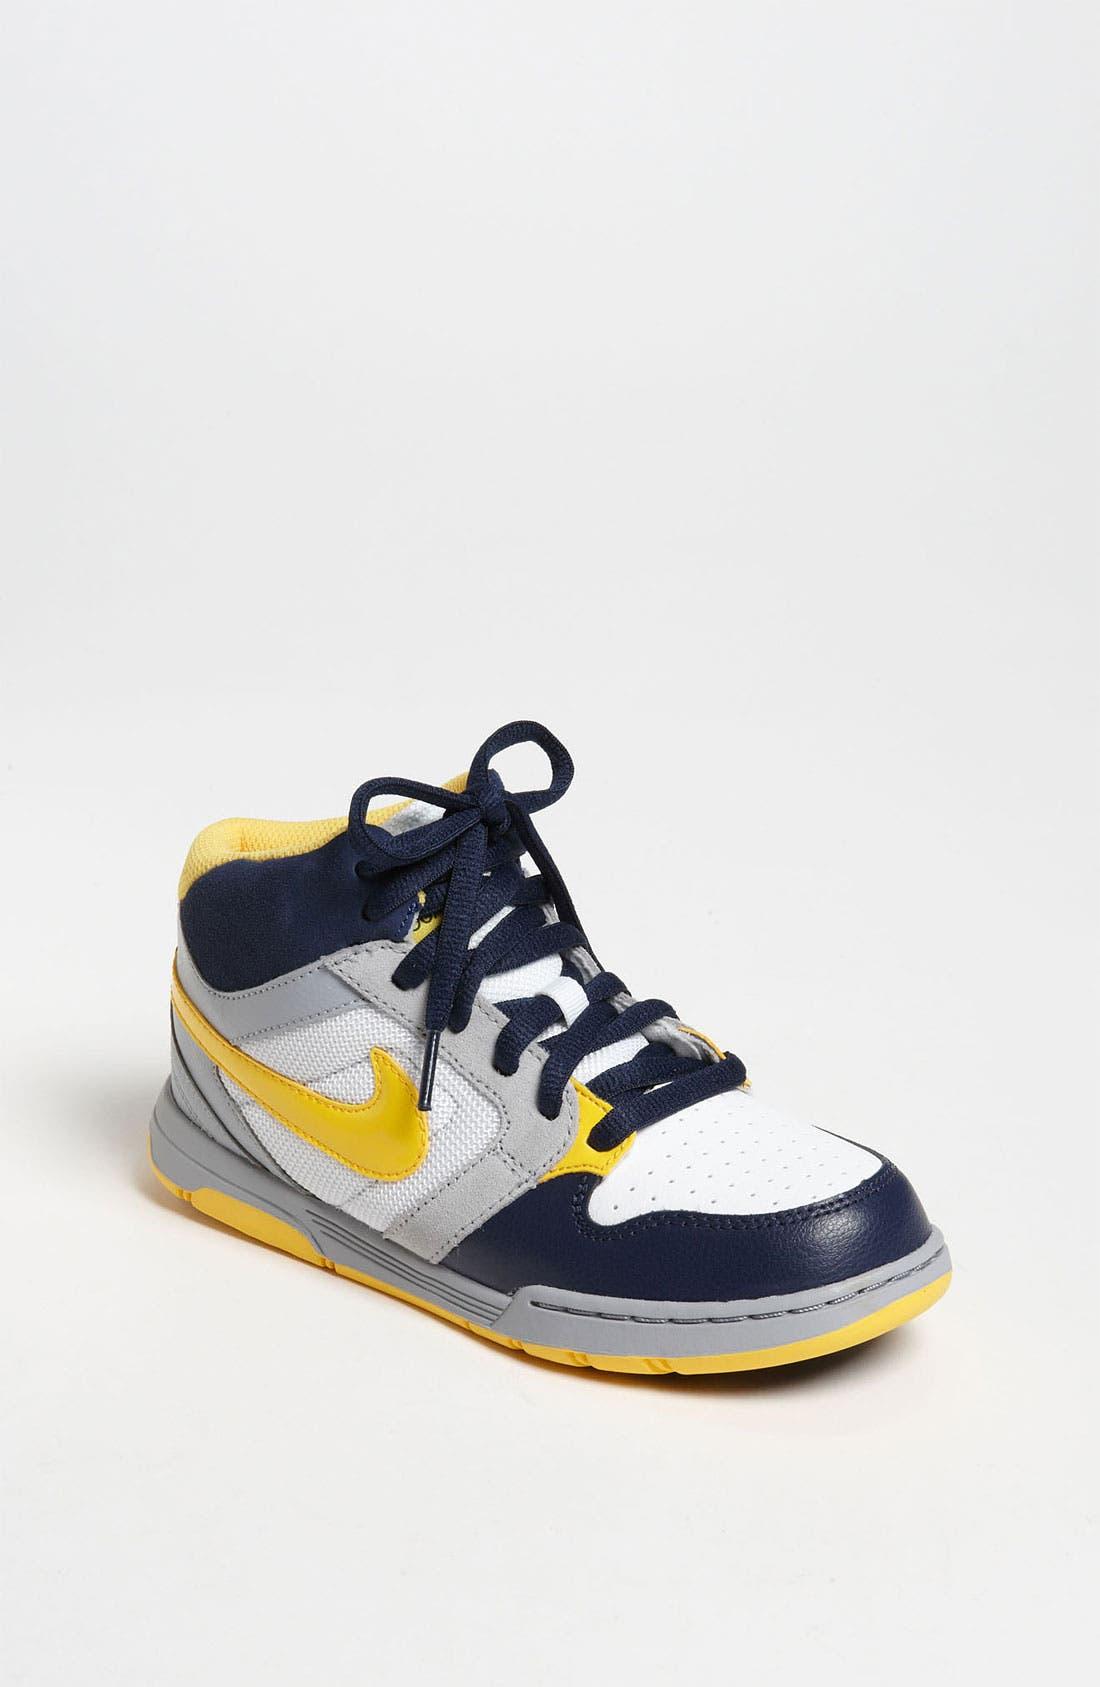 Main Image - Nike 'Mogan Mid 3' Sneaker (Toddler, Little Kid & Big Kid)